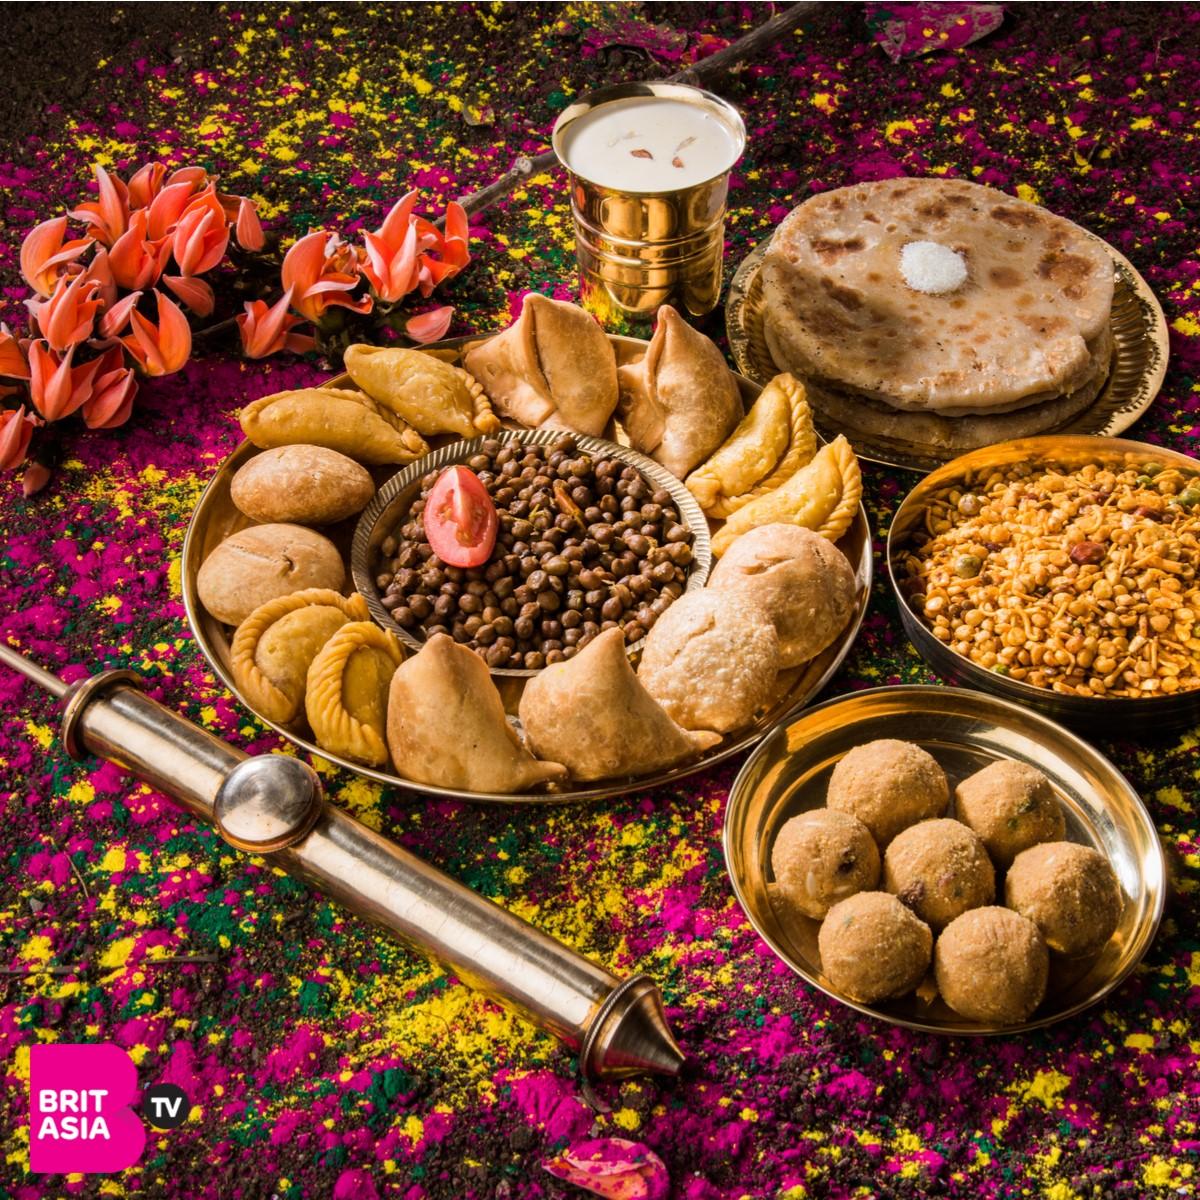 Food at Holi